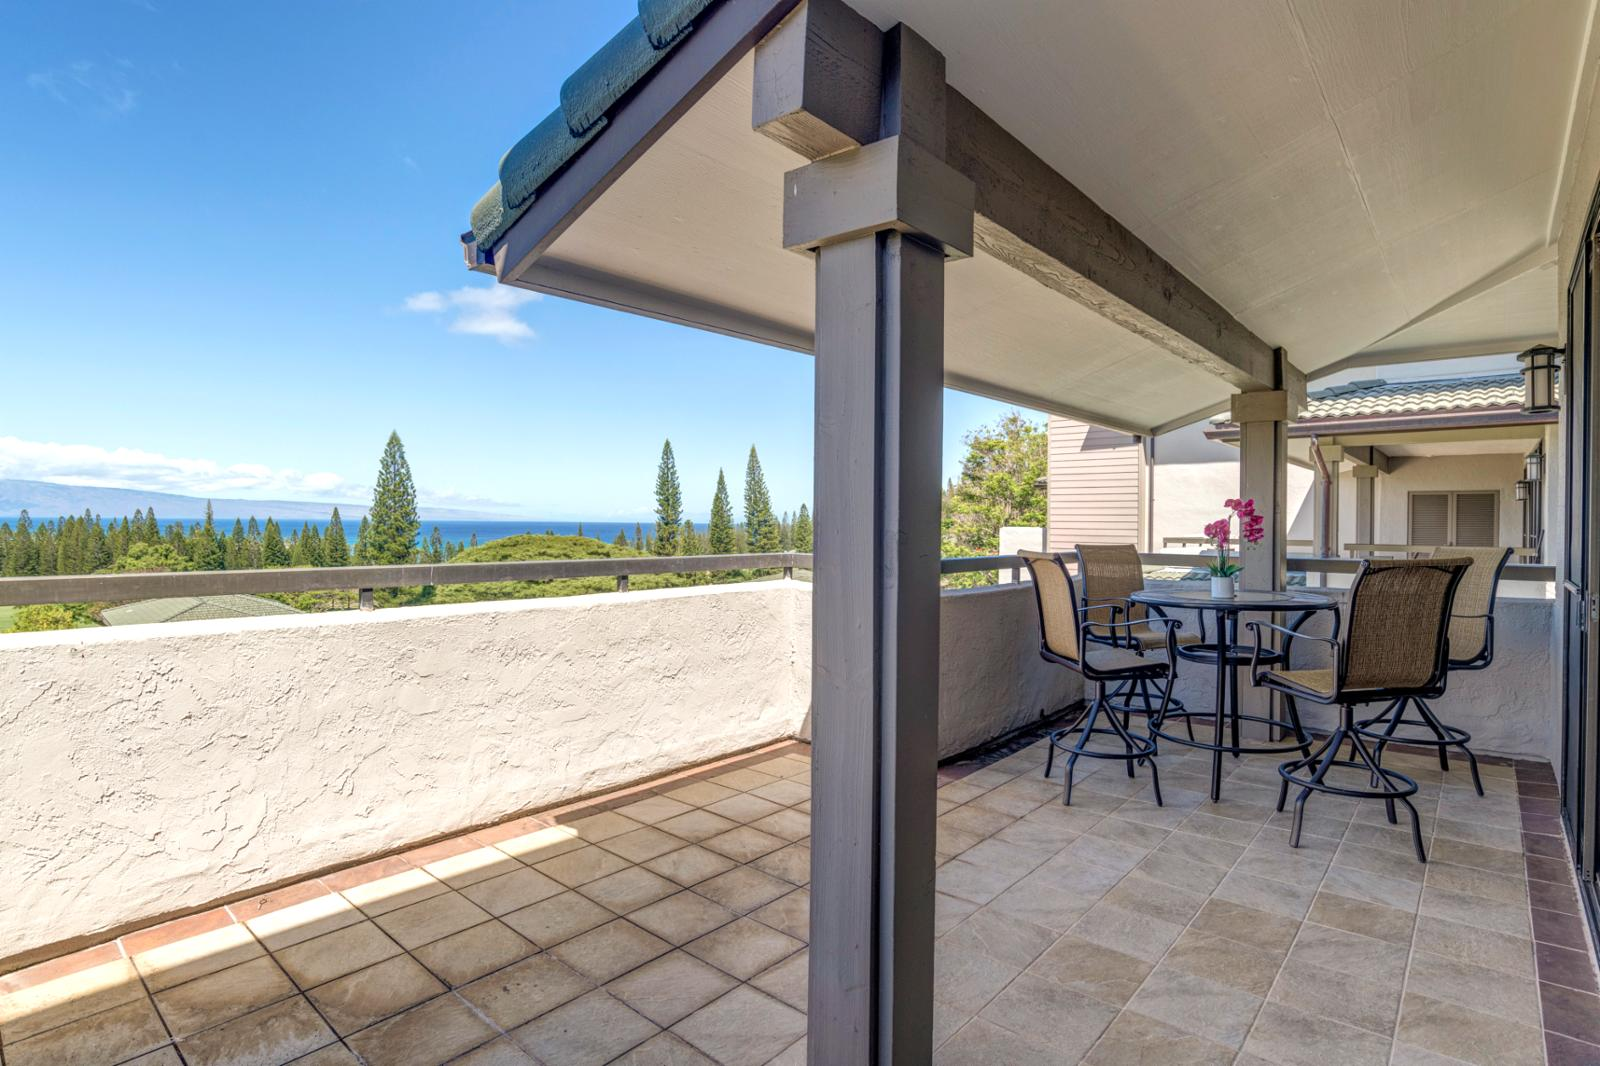 Oversized layout and upgraded balcony furniture